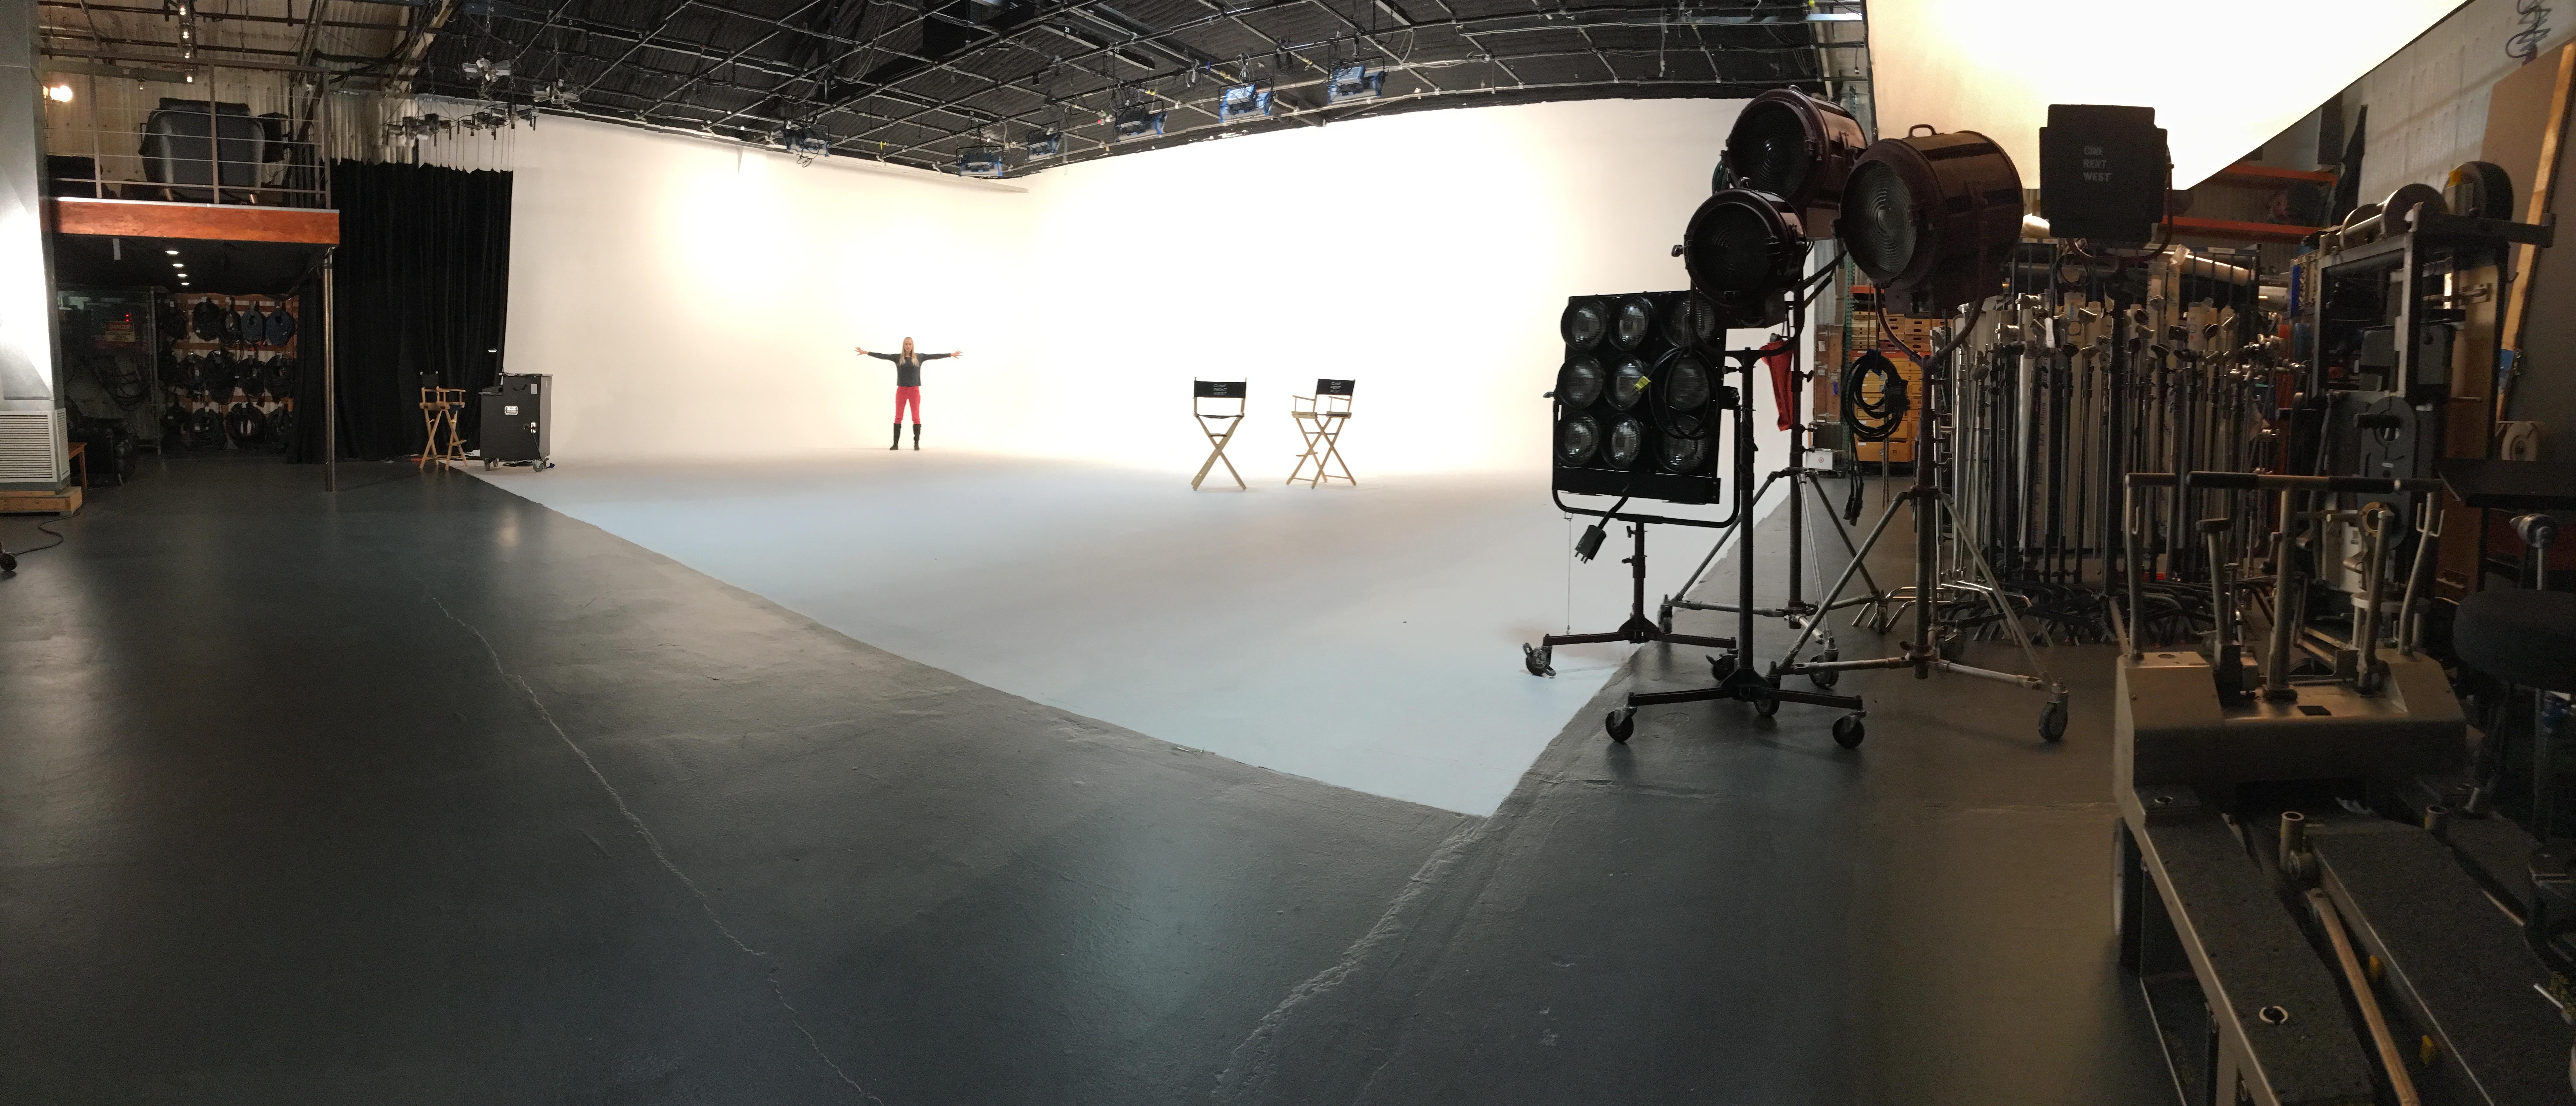 Film Studio Production Studio Sound Stagestudio Layout